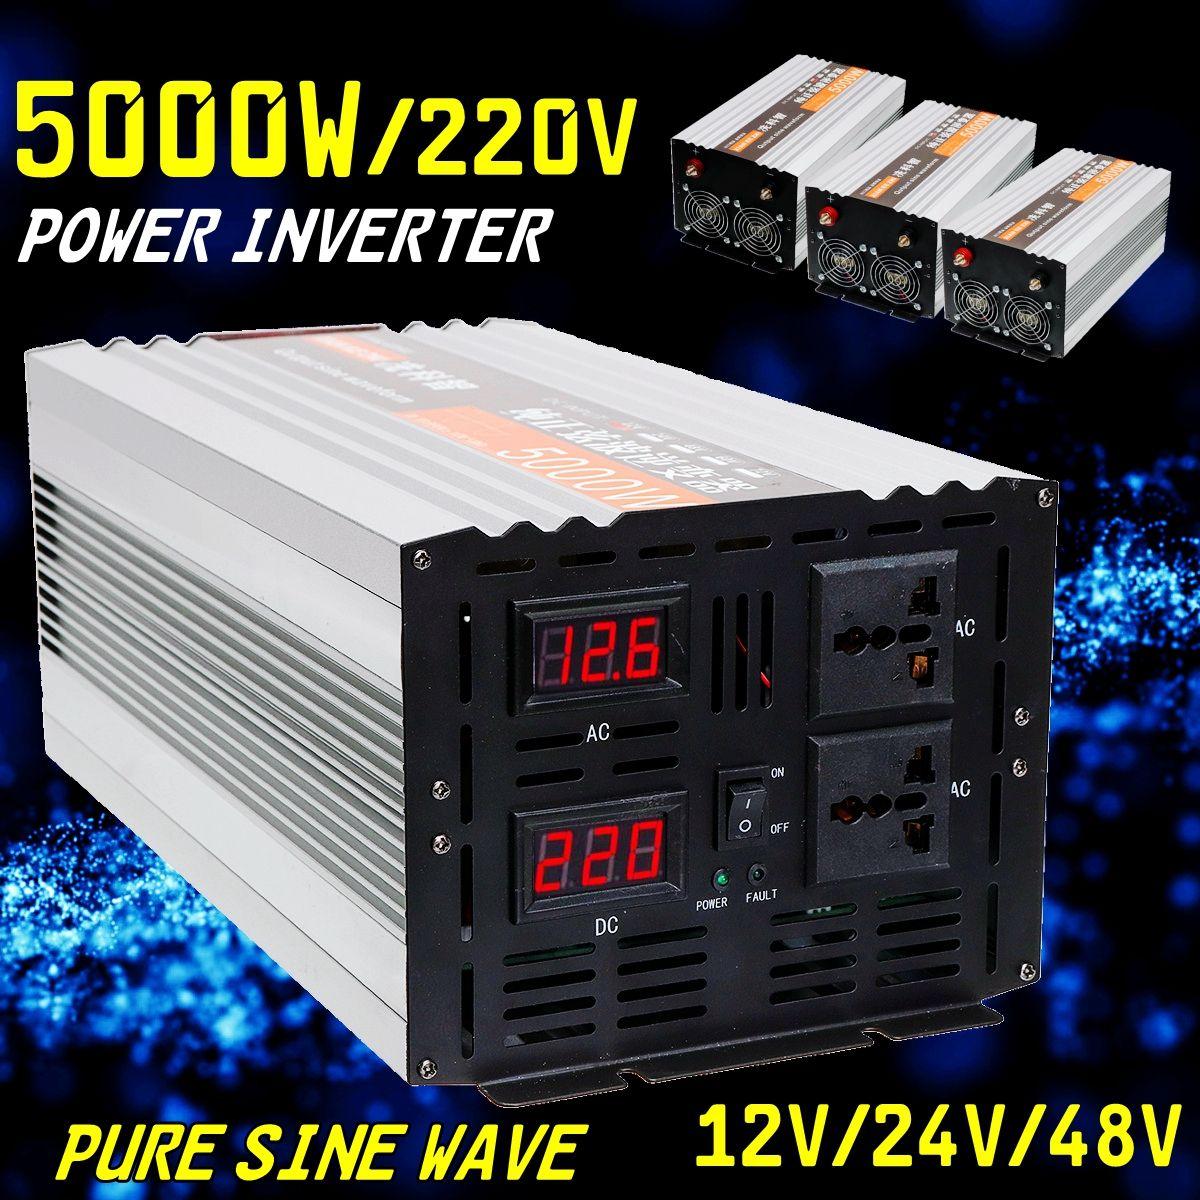 Inverter reine sinus welle 2500 watt 5000 watt P eak DC 12 v/24 v/48 v zu AC 220 v Spannung Transformator Converte Doppel LED digital display